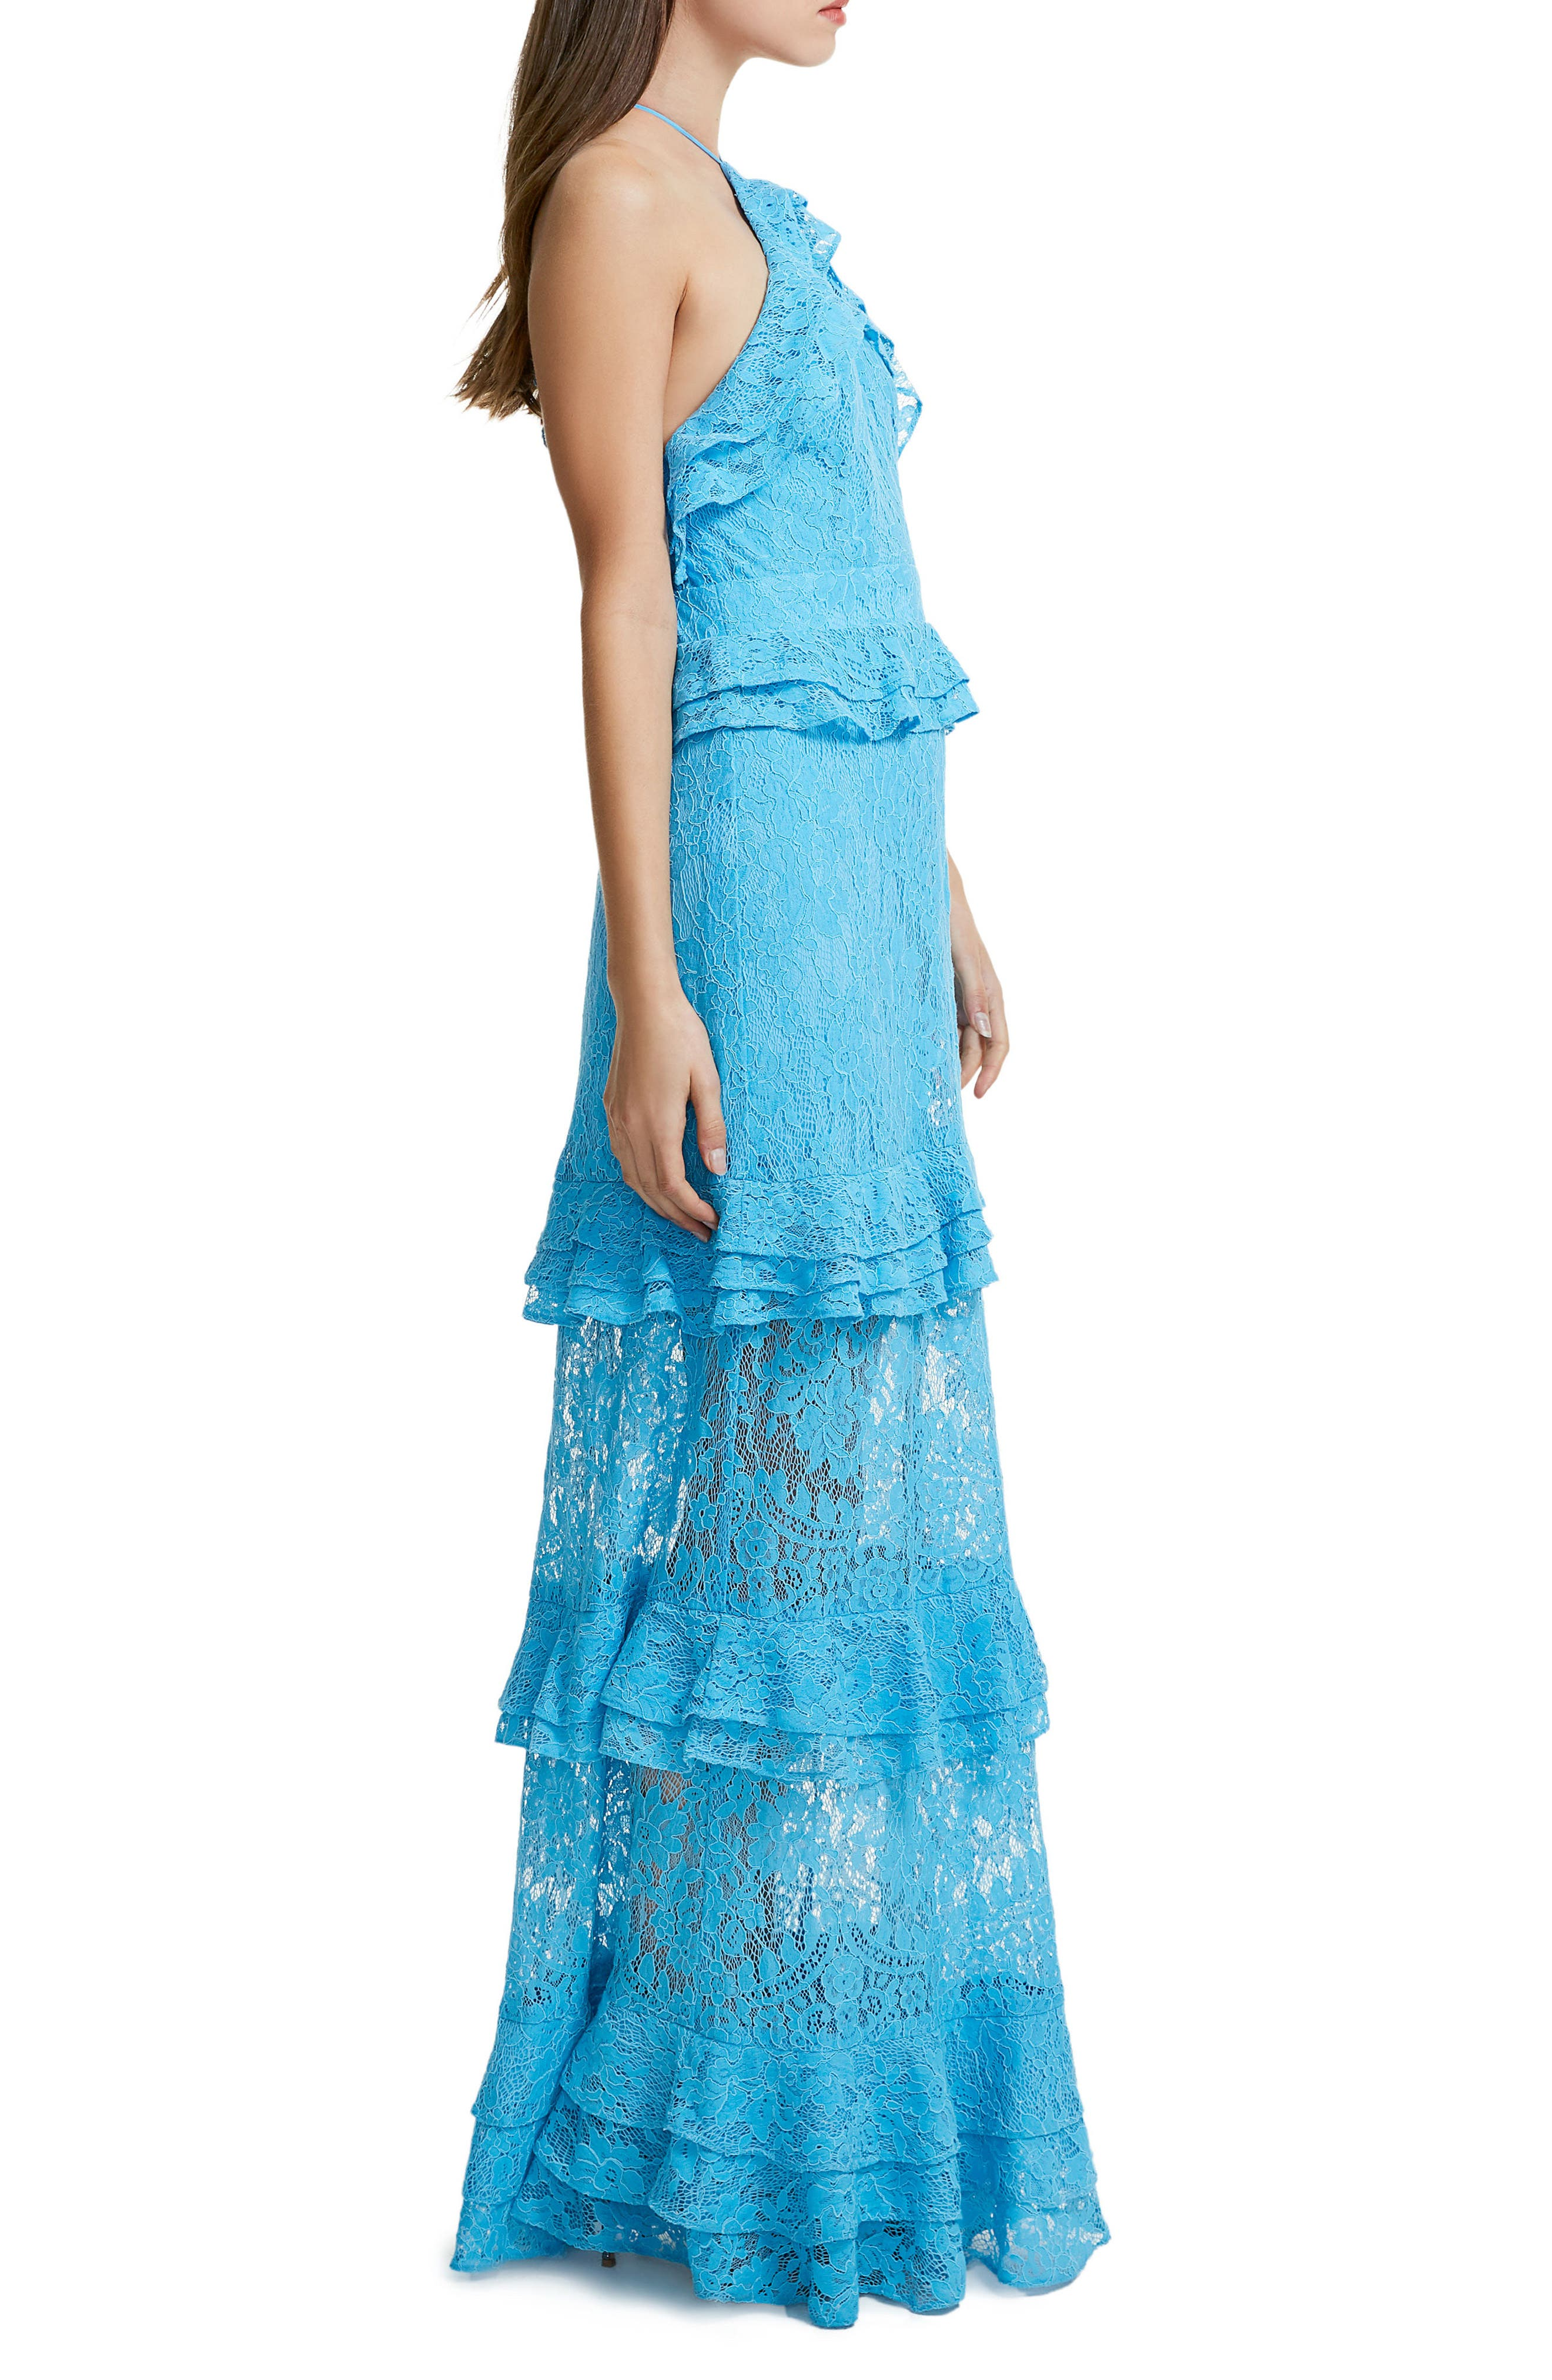 Violet Ruffle Maxi Dress,                             Alternate thumbnail 3, color,                             400